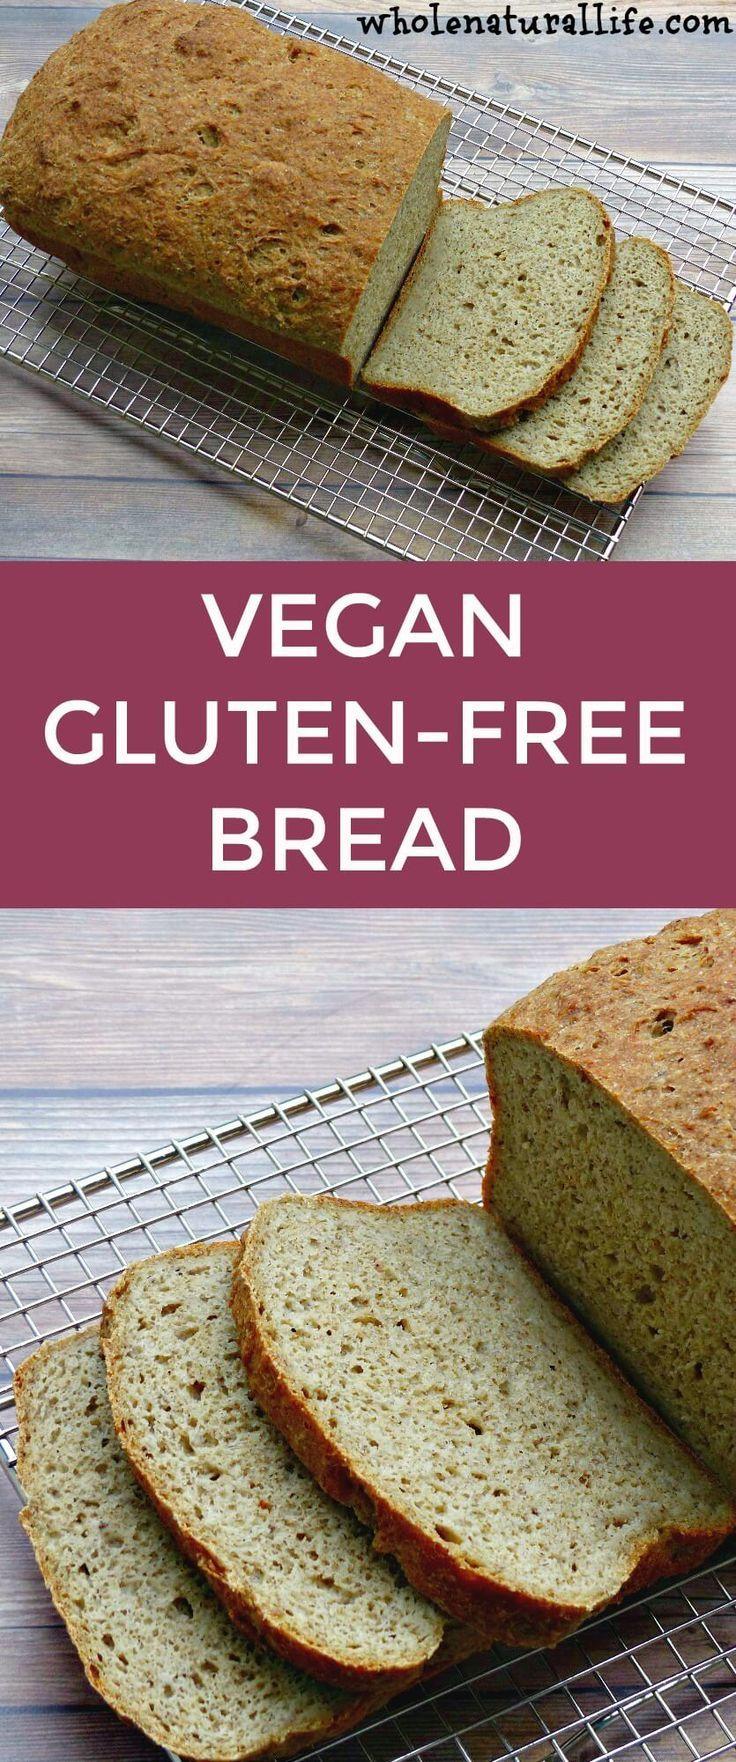 Vegan Gluten Free Bread Recipe Real Food Recipes Cooking